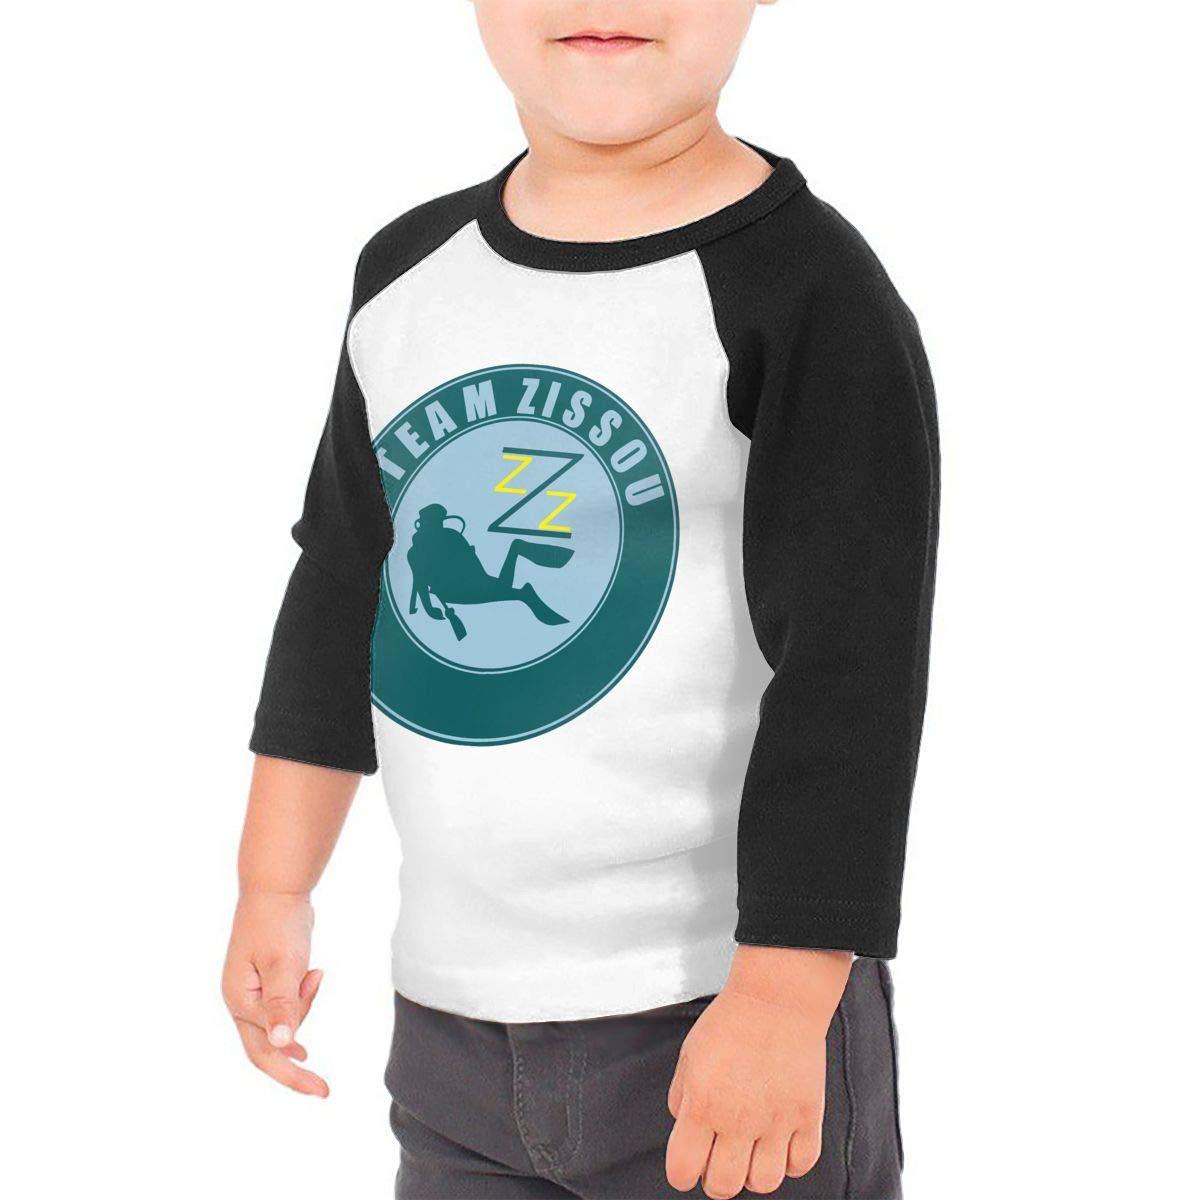 yimo Team Zissou Unisex Toddler Baseball Jersey Contrast 3//4 Sleeves Tee